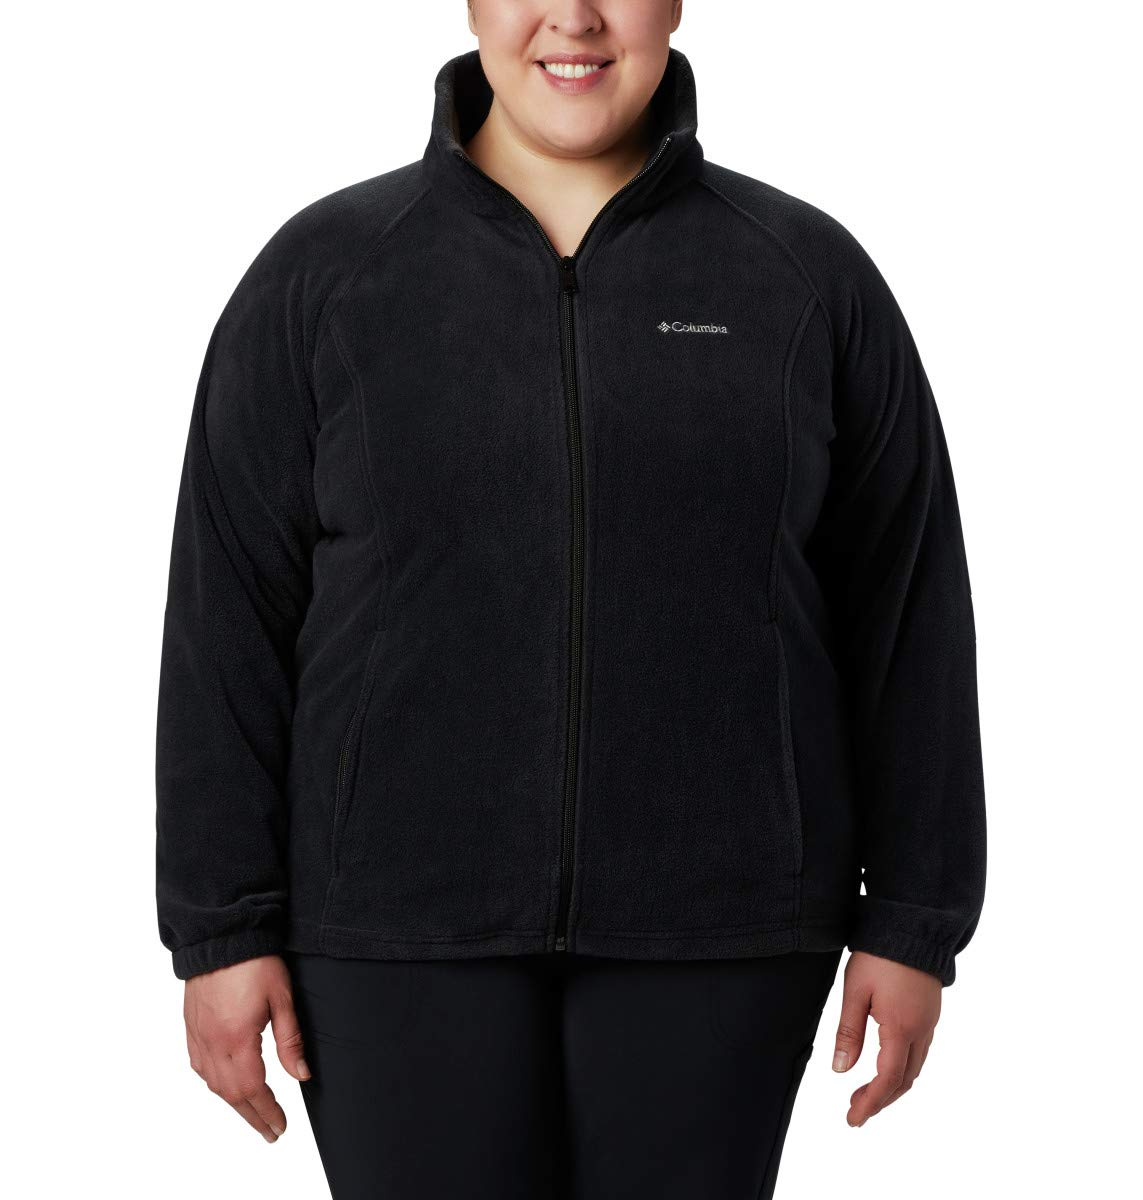 Columbia Womens Benton Springs Full Zip Jacket Black Cherry Petite Medium Soft Fleece with Classic Fit